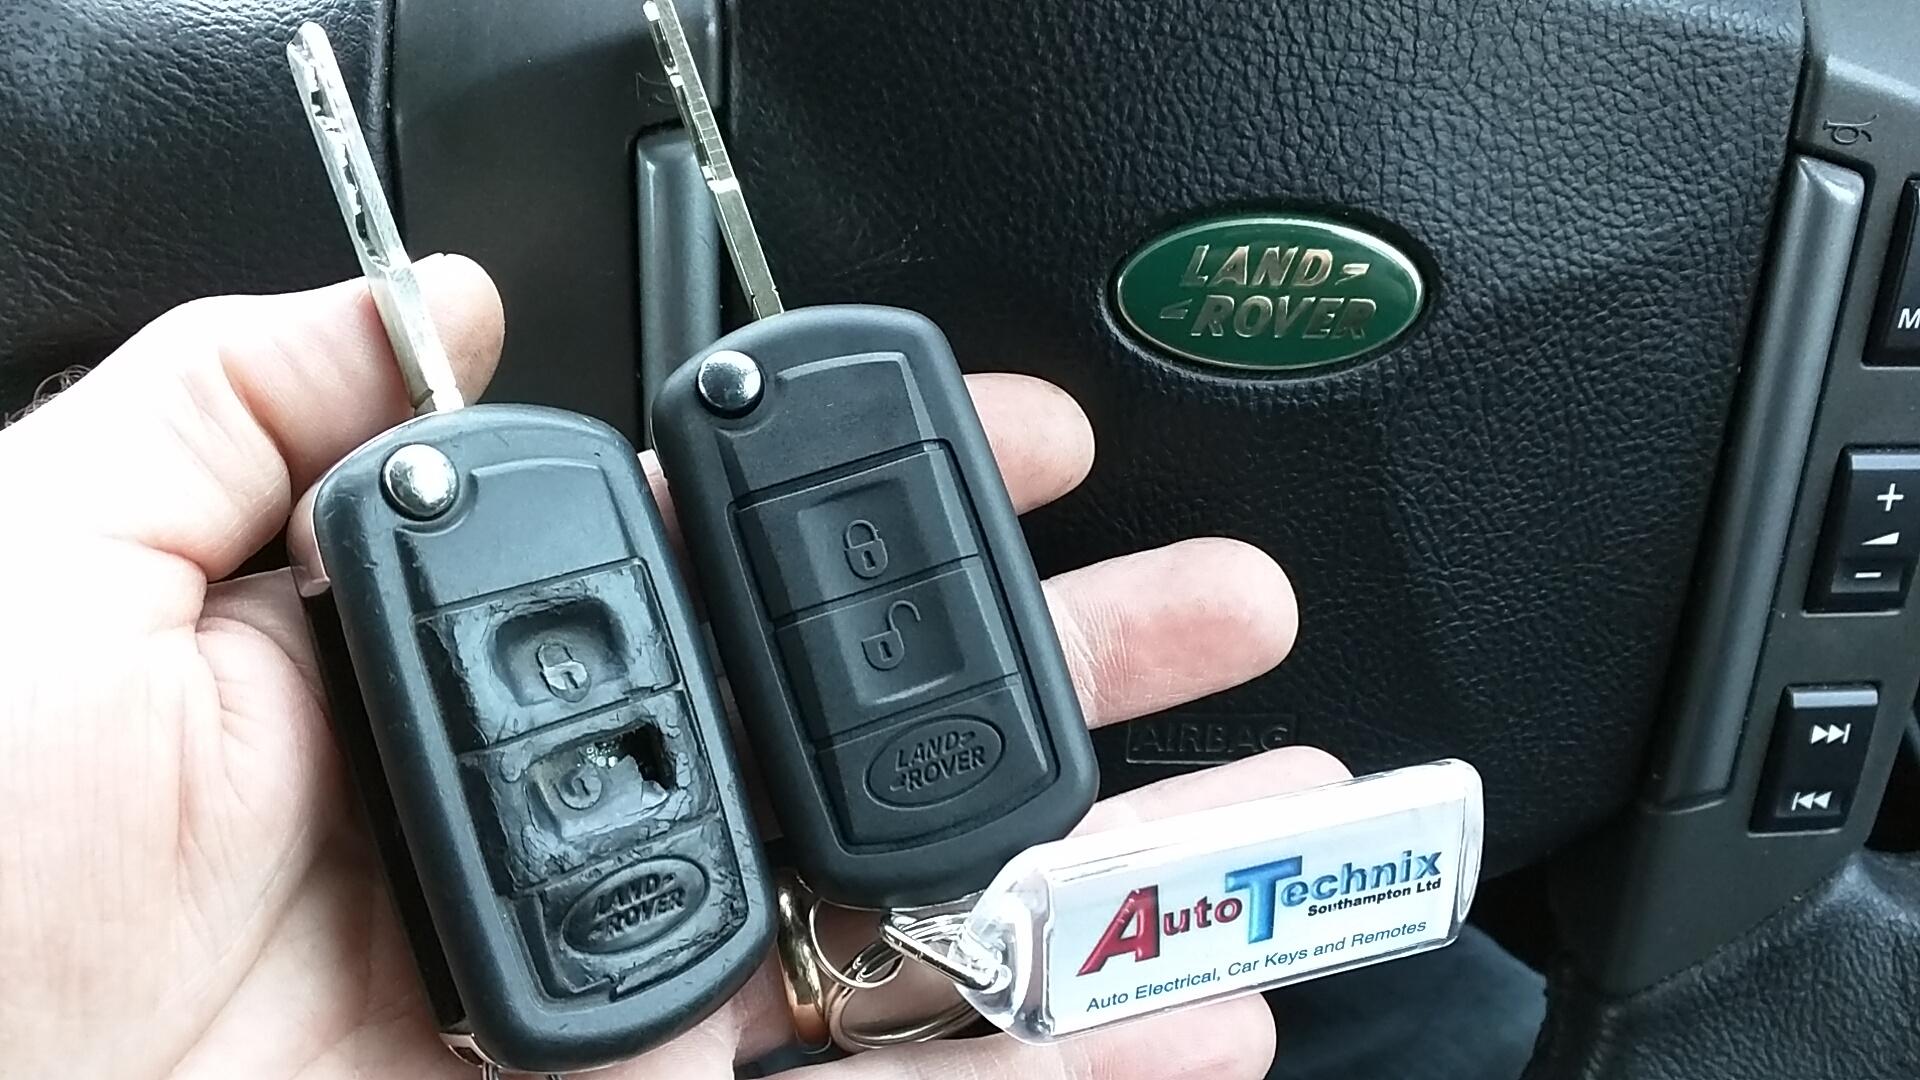 Autotechnix Southampton Ltd Spare Car Key Car Key Replacement